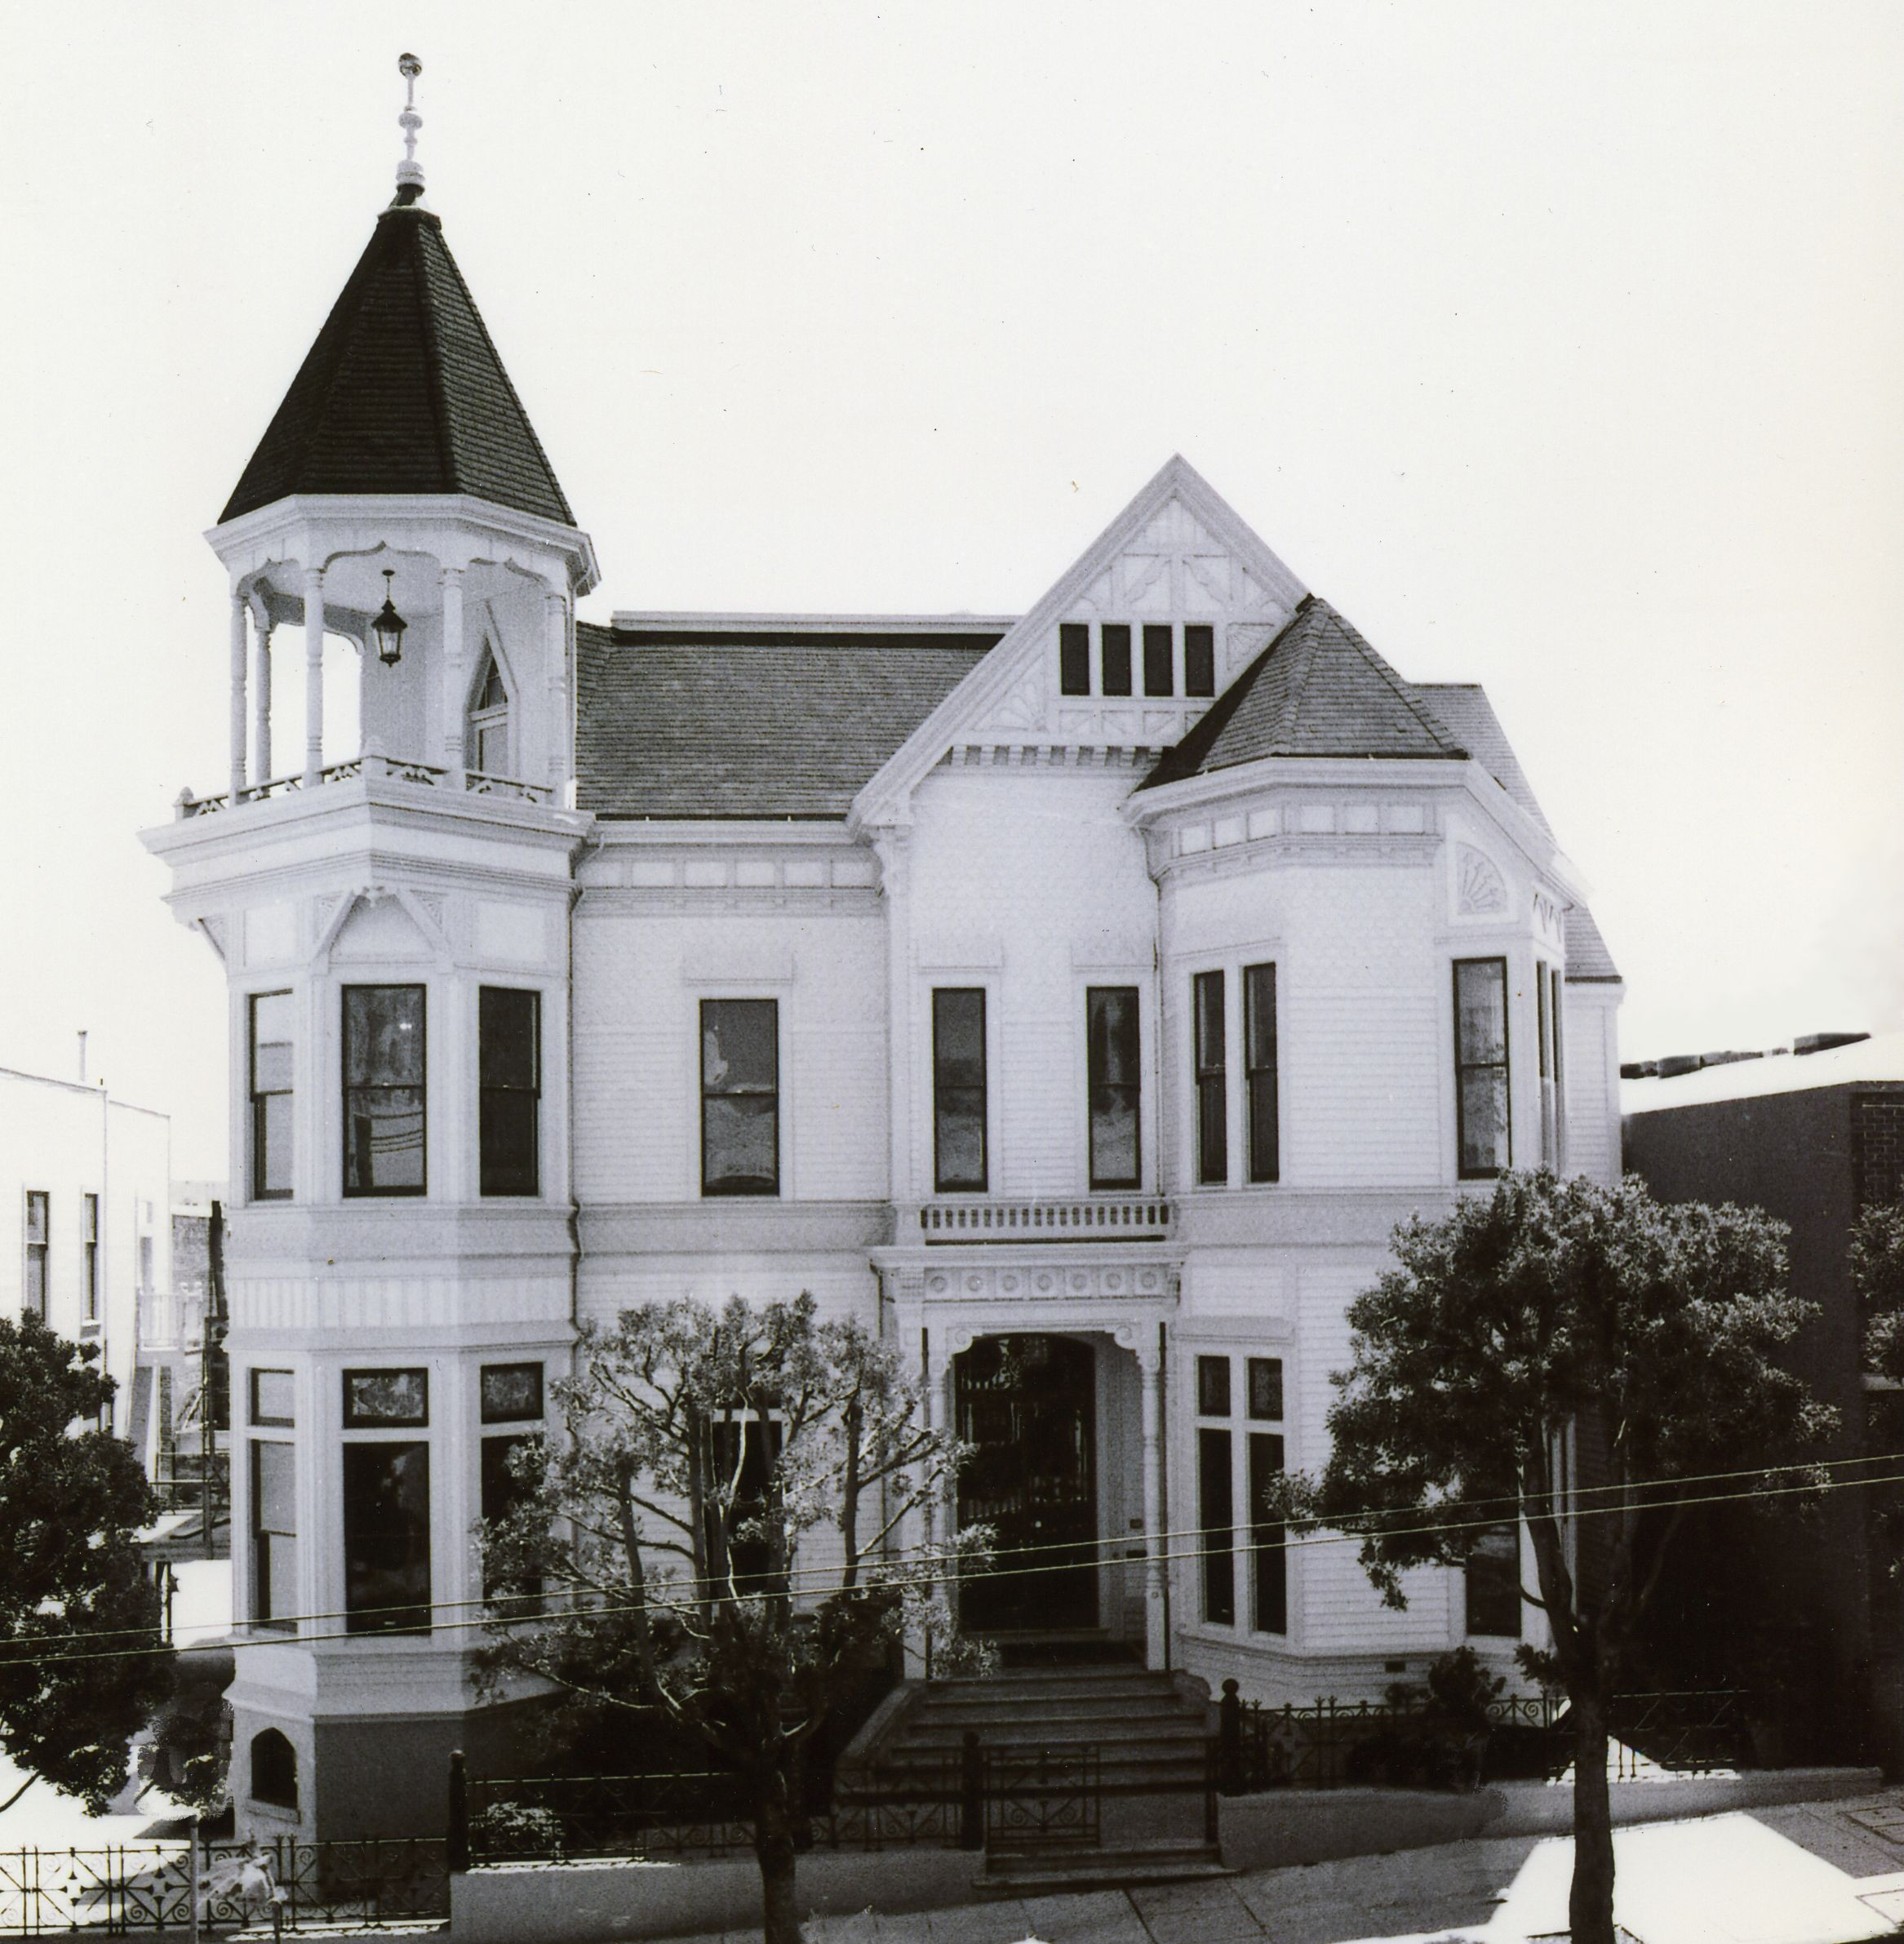 The Payne House 1409 Sutter Street San Francisco Victorian House Plans Victorian Homes Victorian Architecture